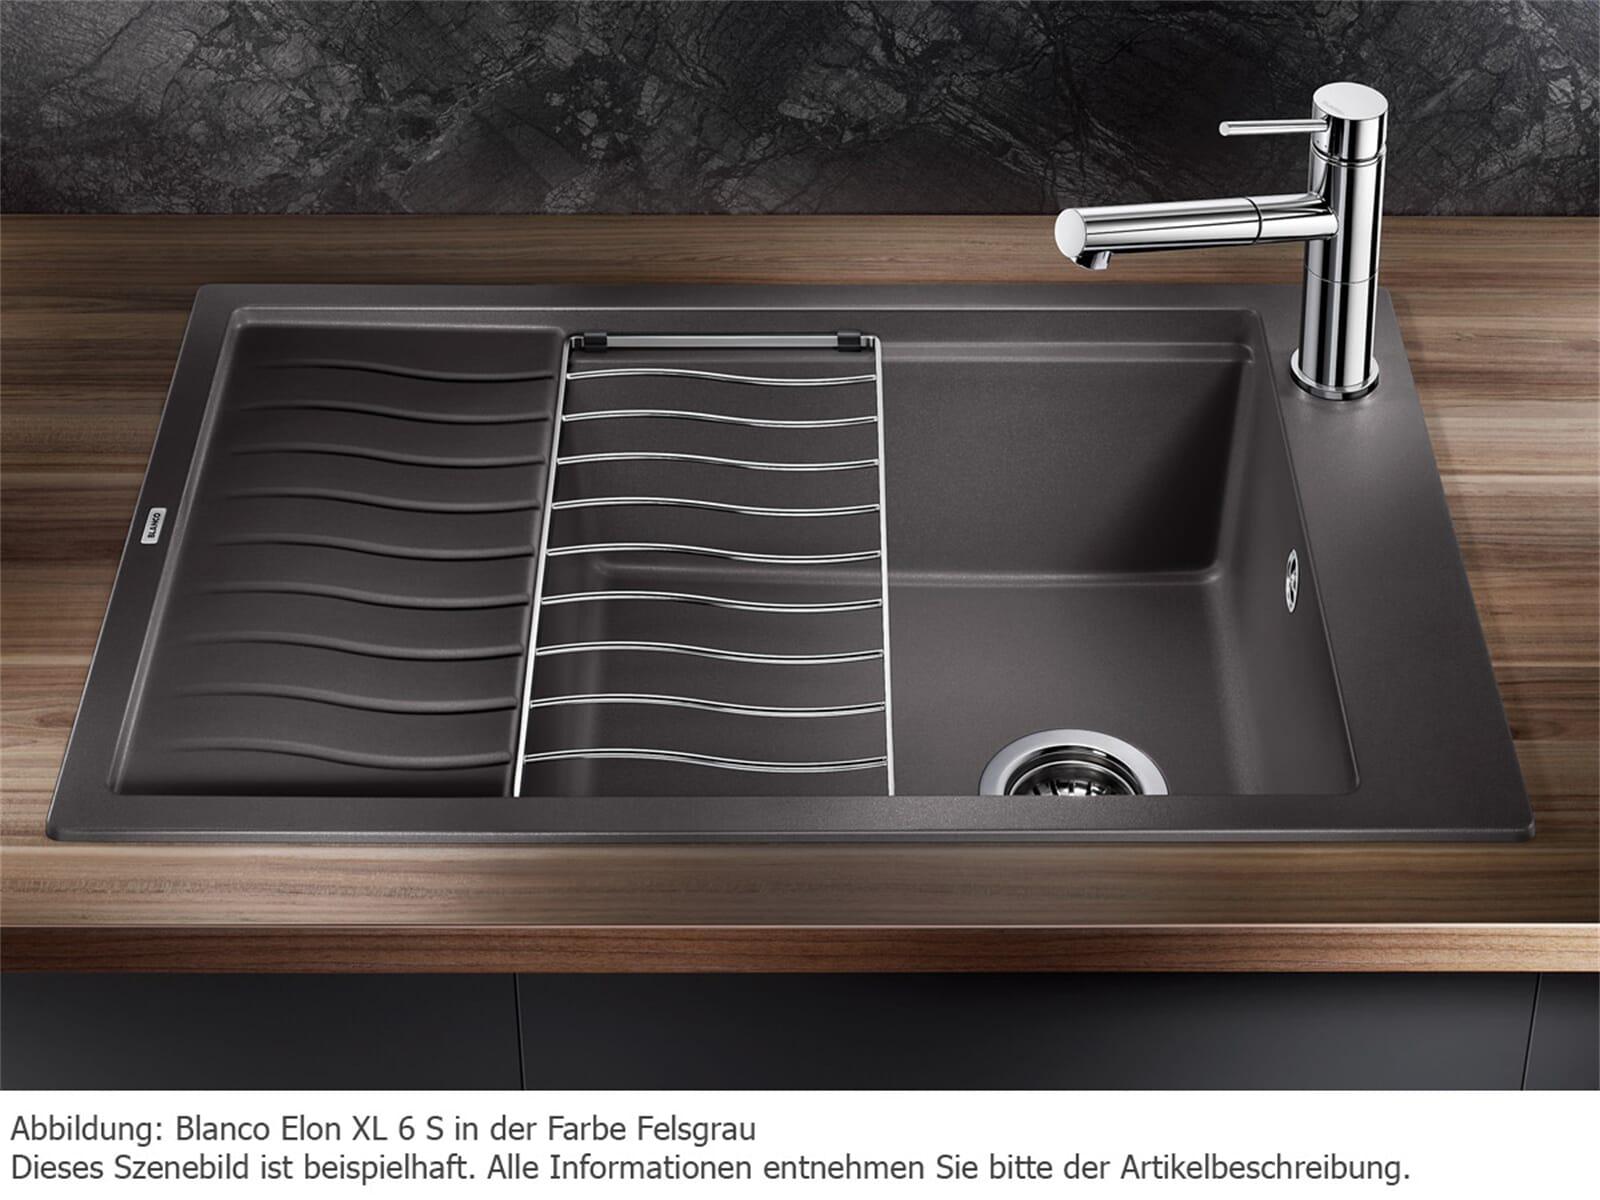 blanco elon xl 6 s tartufo granitsp le. Black Bedroom Furniture Sets. Home Design Ideas